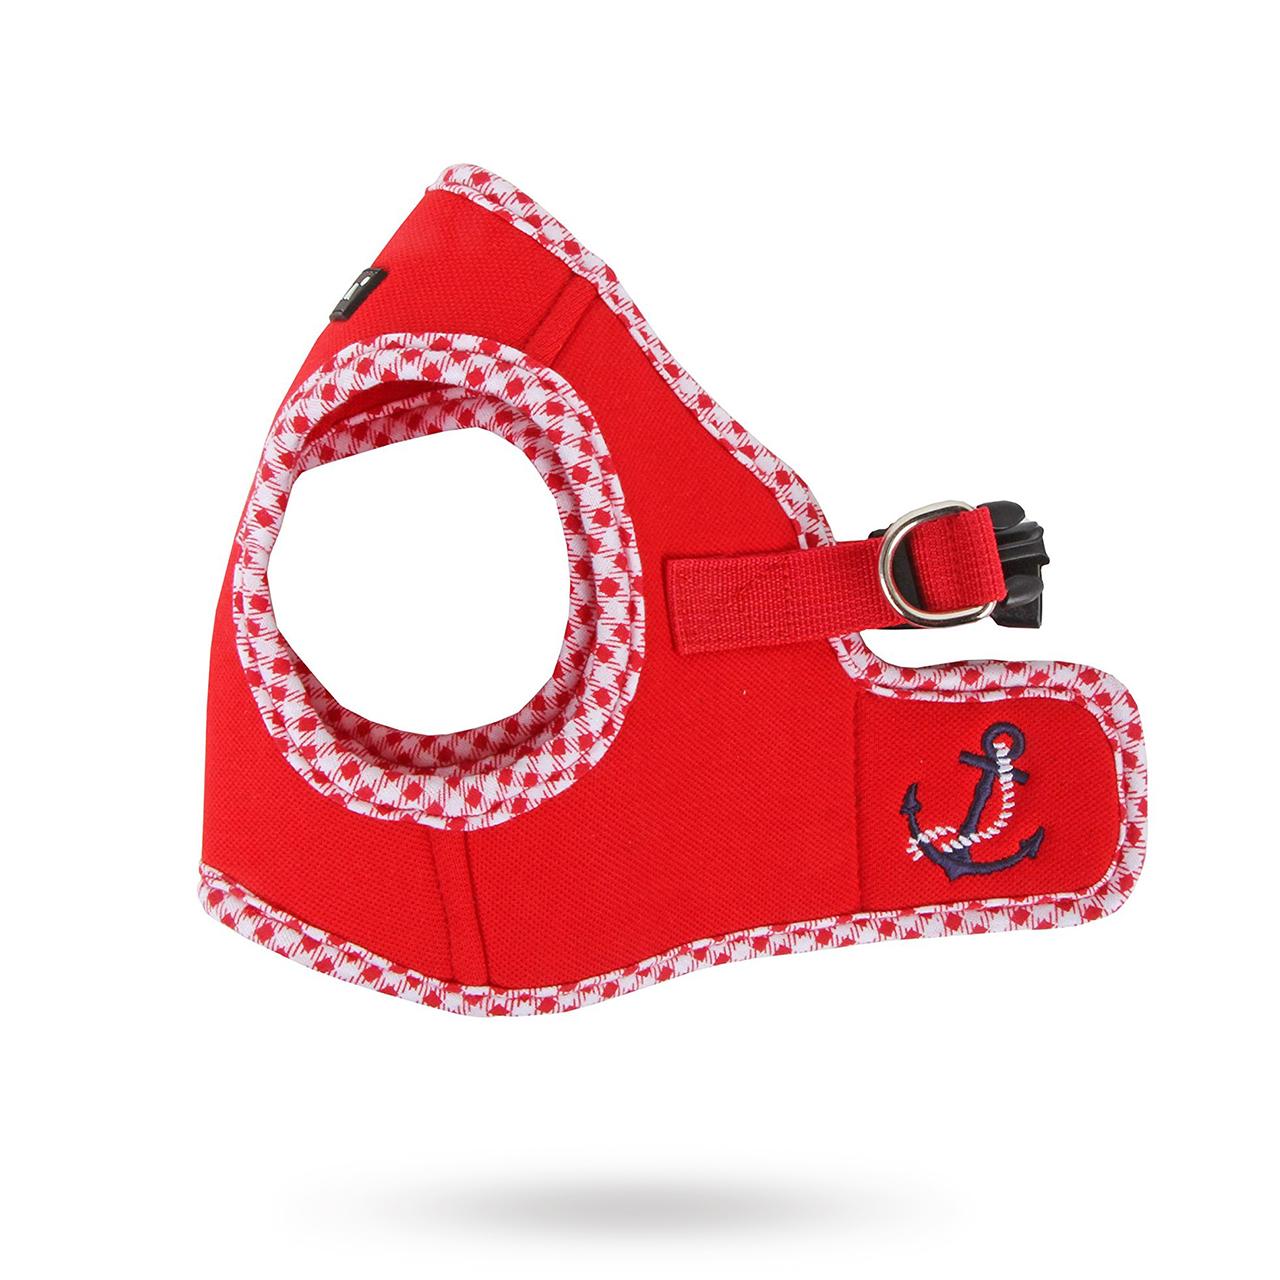 ATTICUS Red - Jacket Hundsele